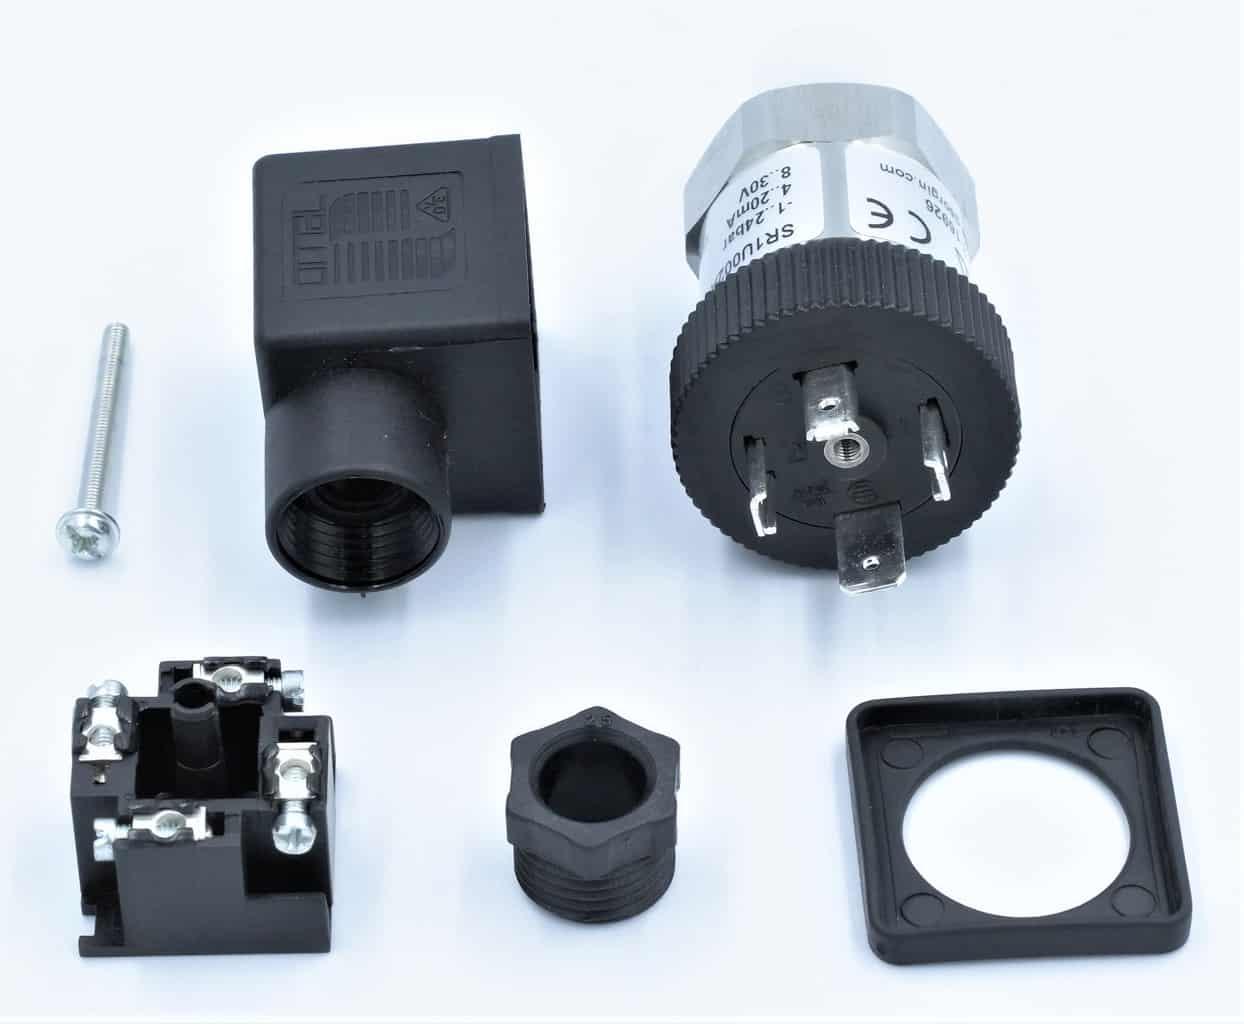 Cấu tạo của cảm biến áp suất SR1 0-4 bar